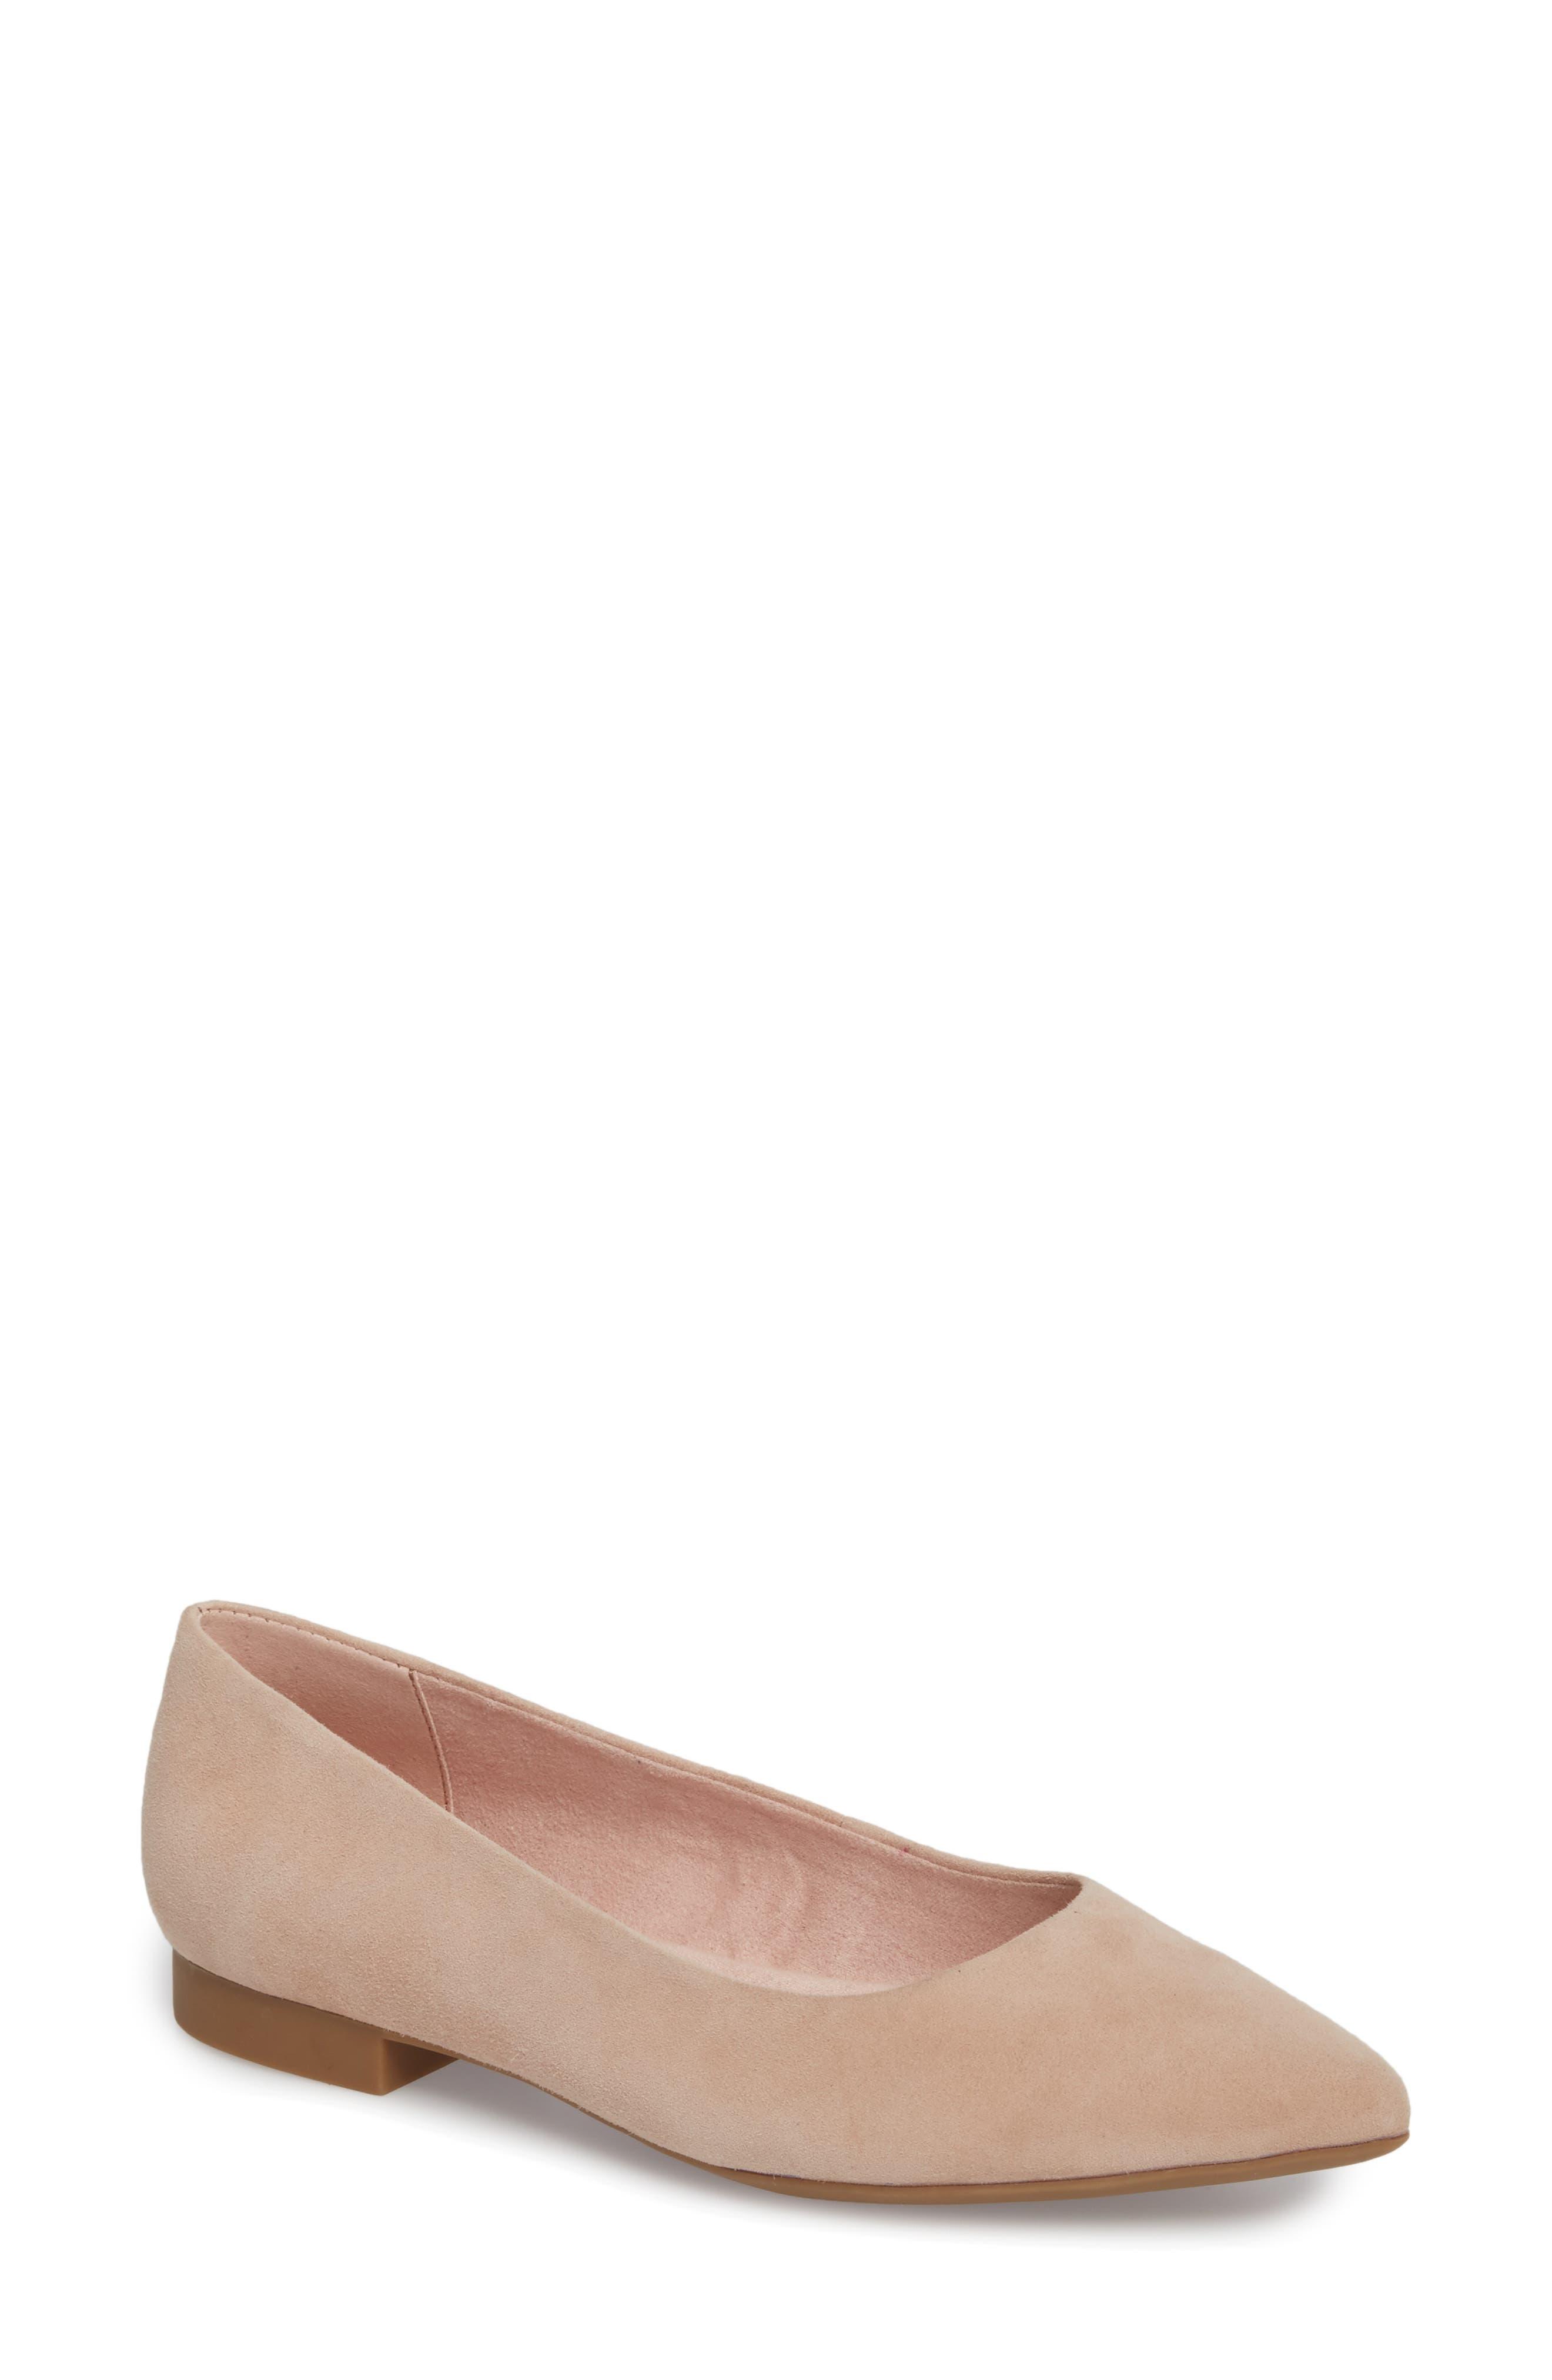 BELLA VITA 'Vivien' Pointy Toe Flat, Main, color, BLUSH SUEDE